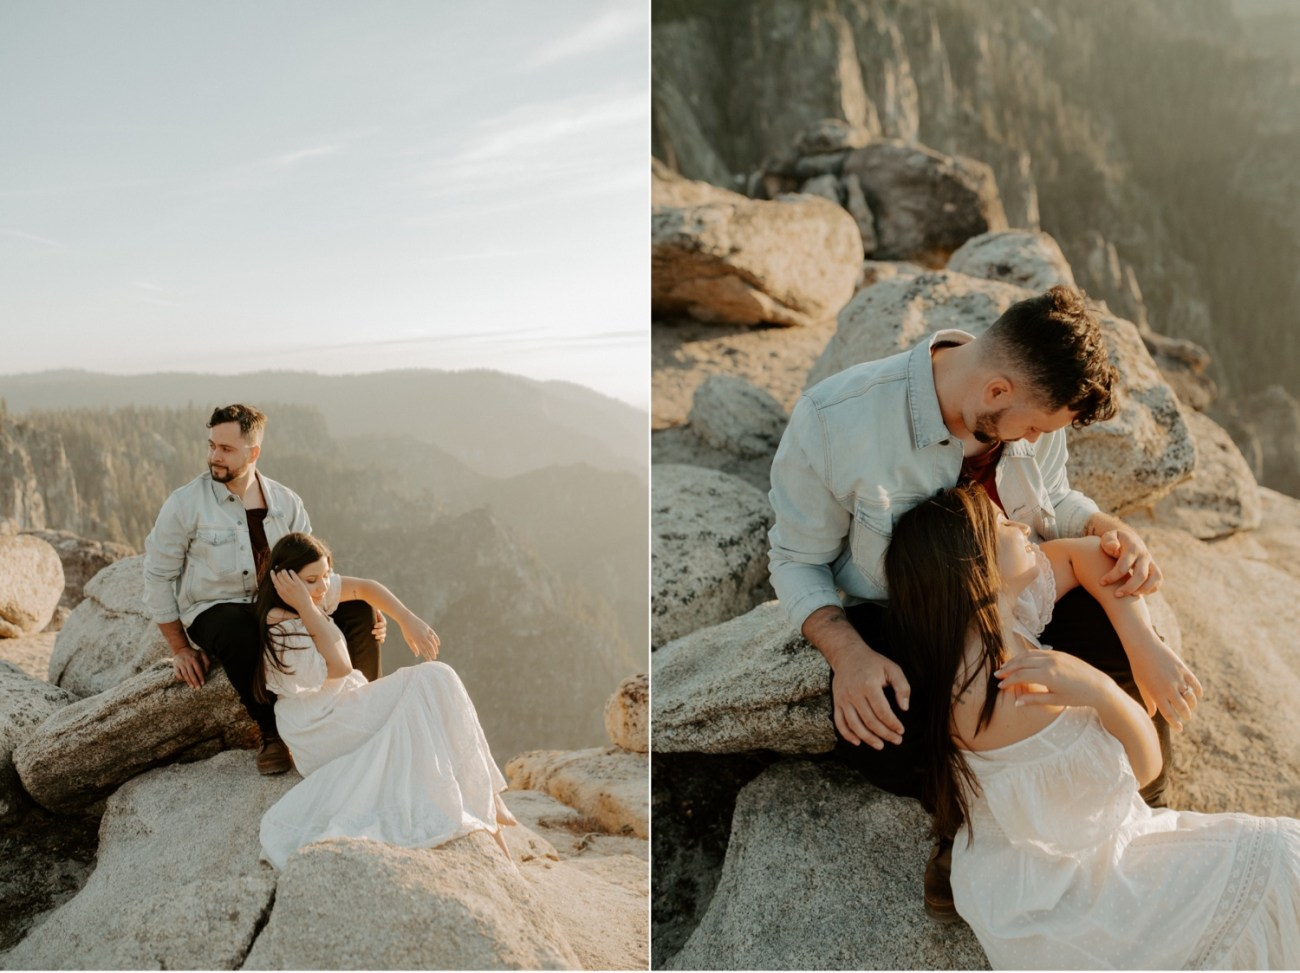 Yosemite Taft Point Engagement Session California Wedding Photographer Anais Possamai Photography 27